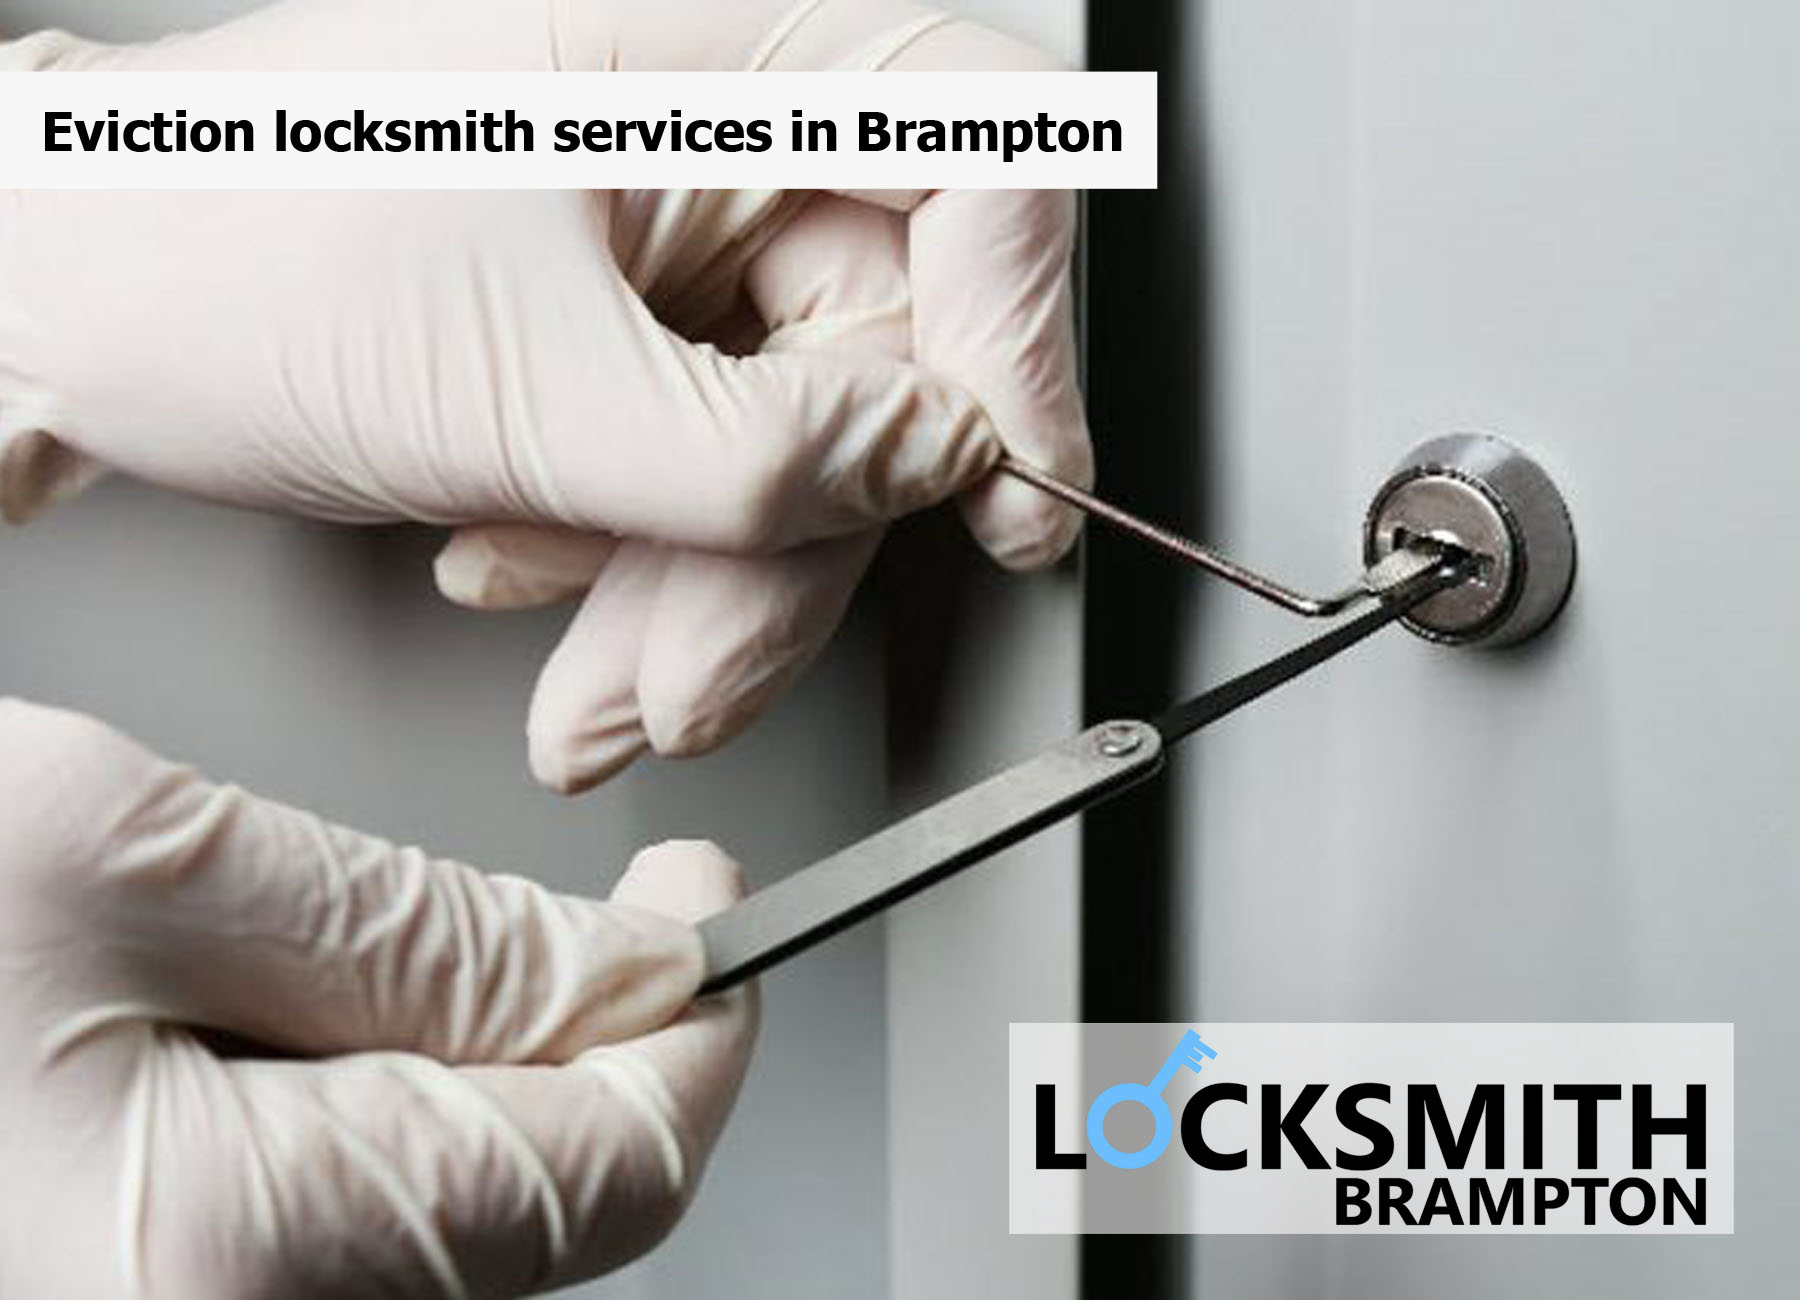 Eviction locksmith service in Brampton